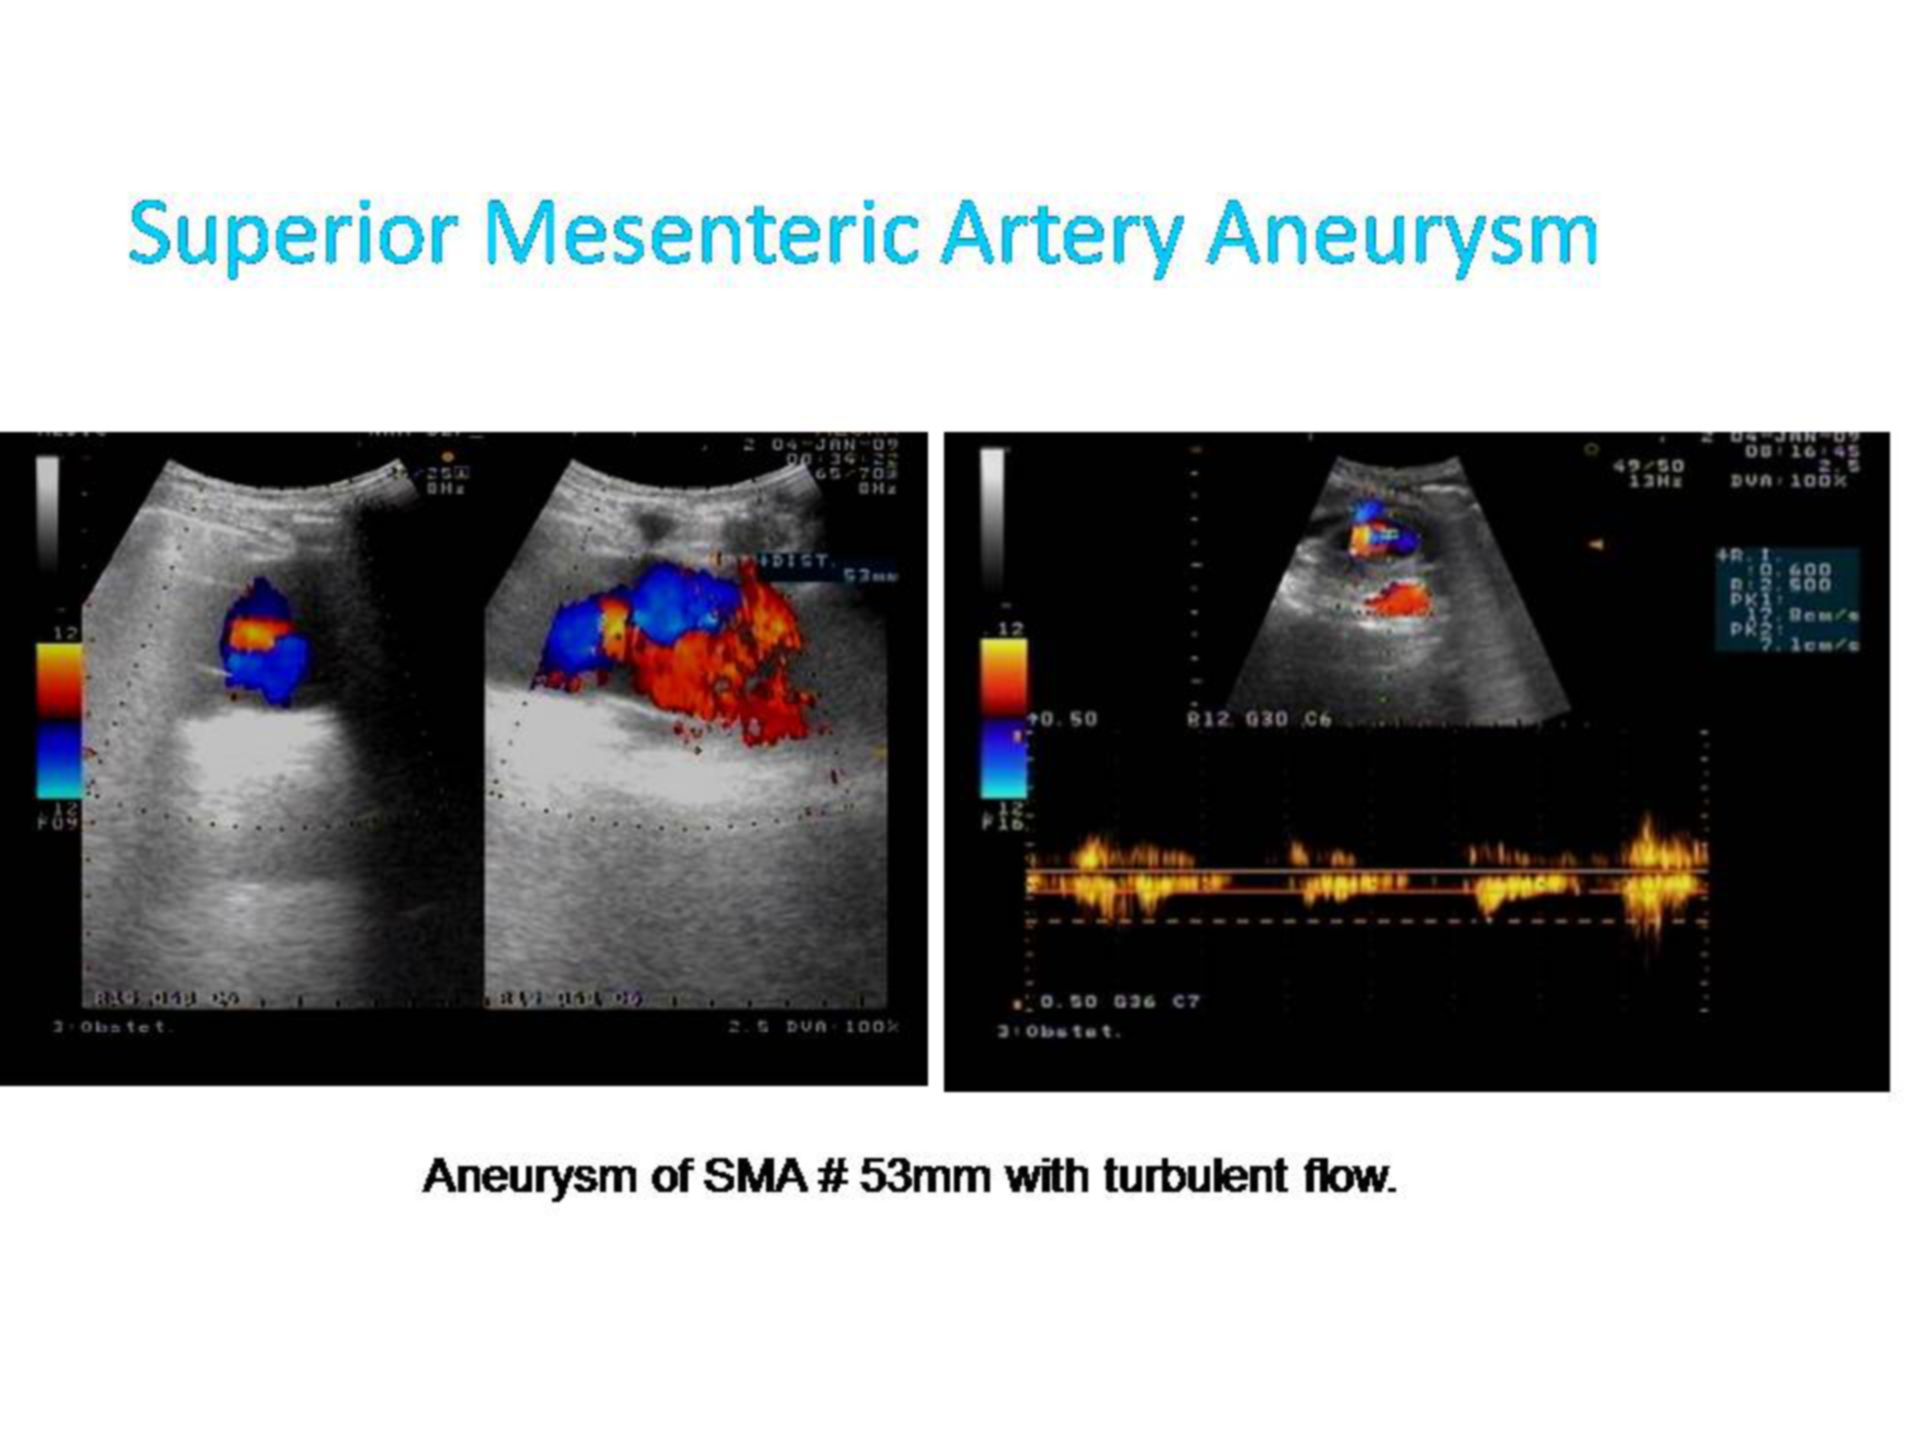 Aneurysma in der Arteria mesenterica superior (1)